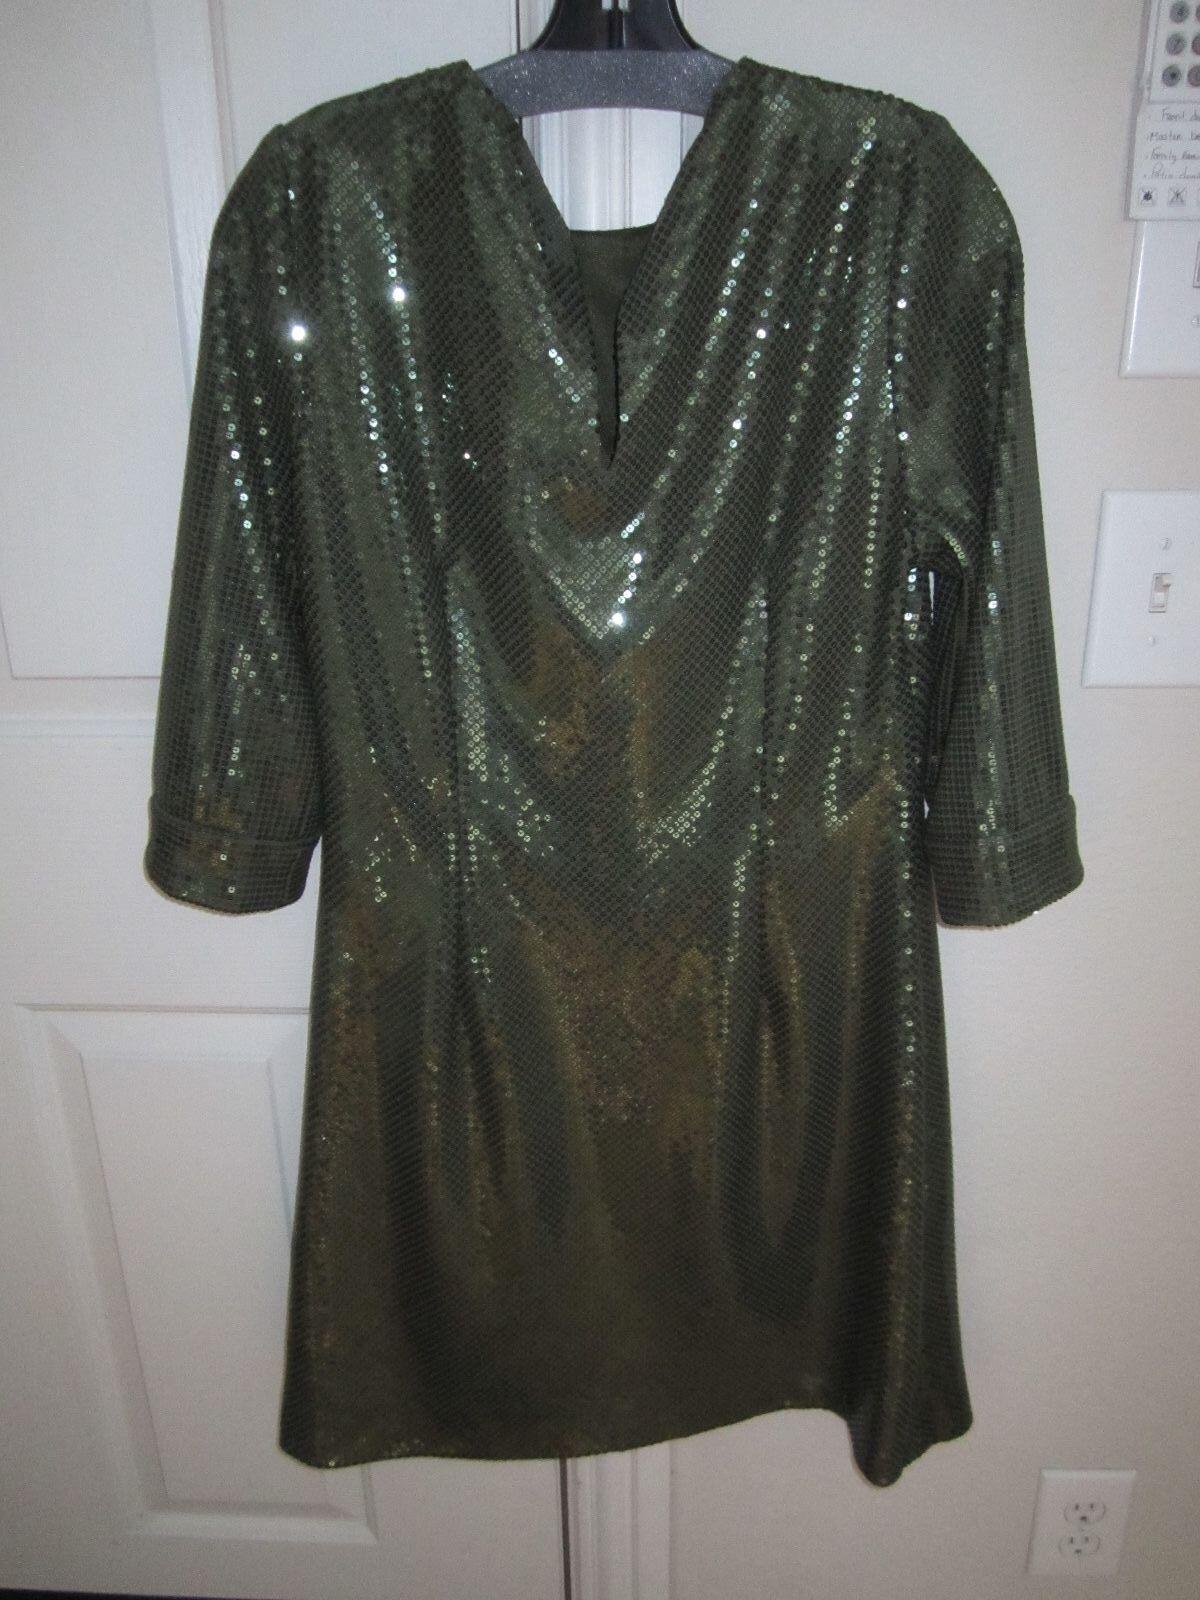 Vestido de lentejuelas  verdes CHETTA B-Sherrie Bloom Peter novielo Talla 12